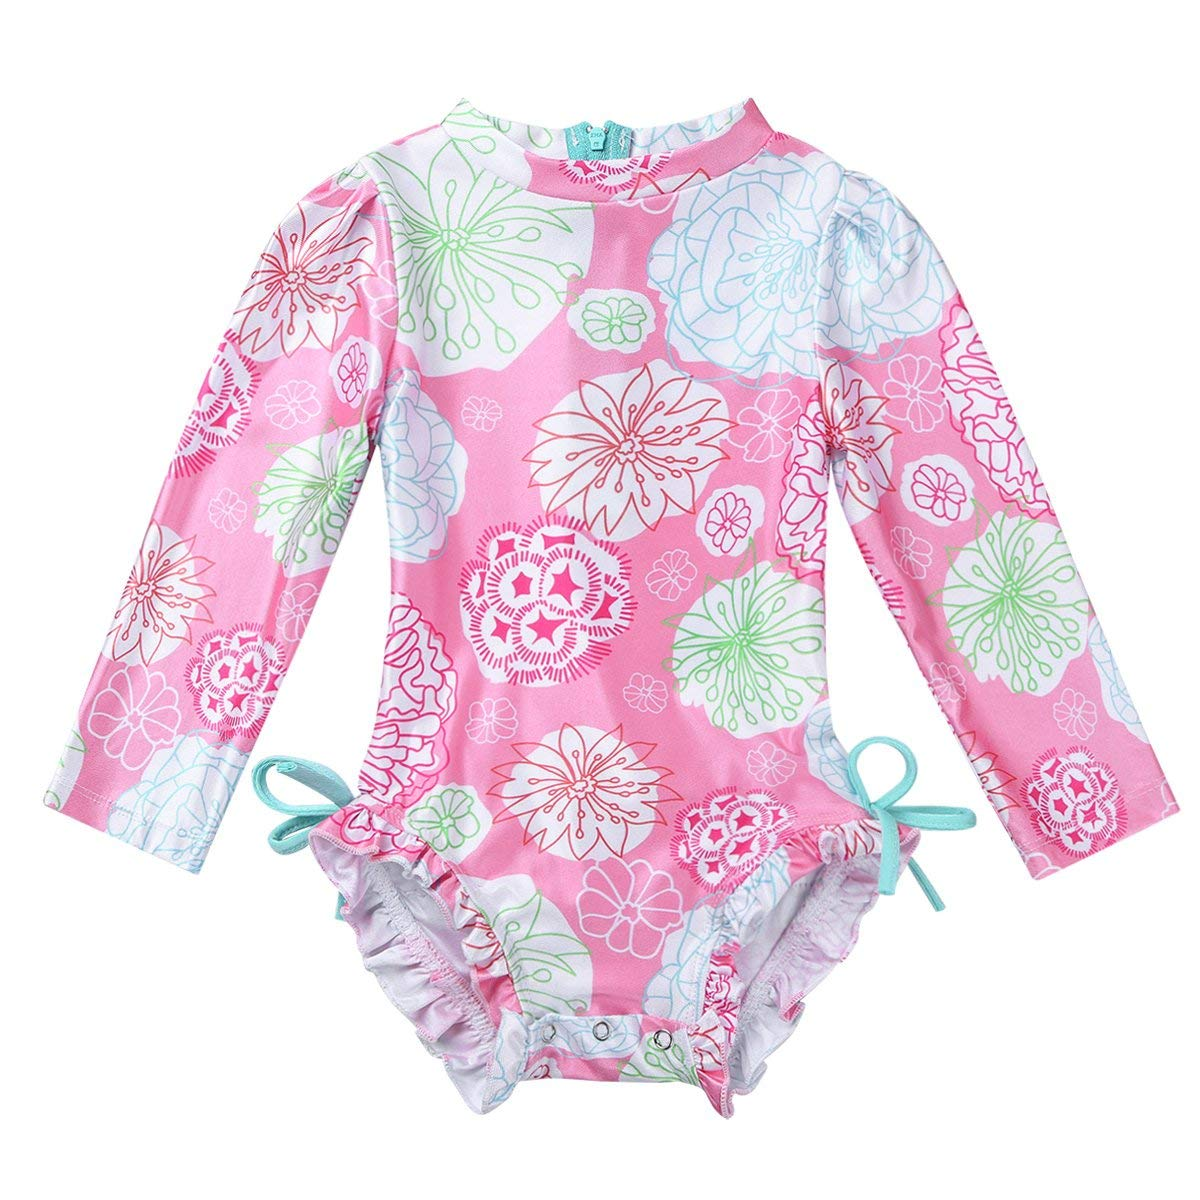 8e7addd8c1 Get Quotations · YiZYiF Baby/Toddler Girls' Flower Rash Guard Swimsuit Sun  Protection Bodysuit Swimwear